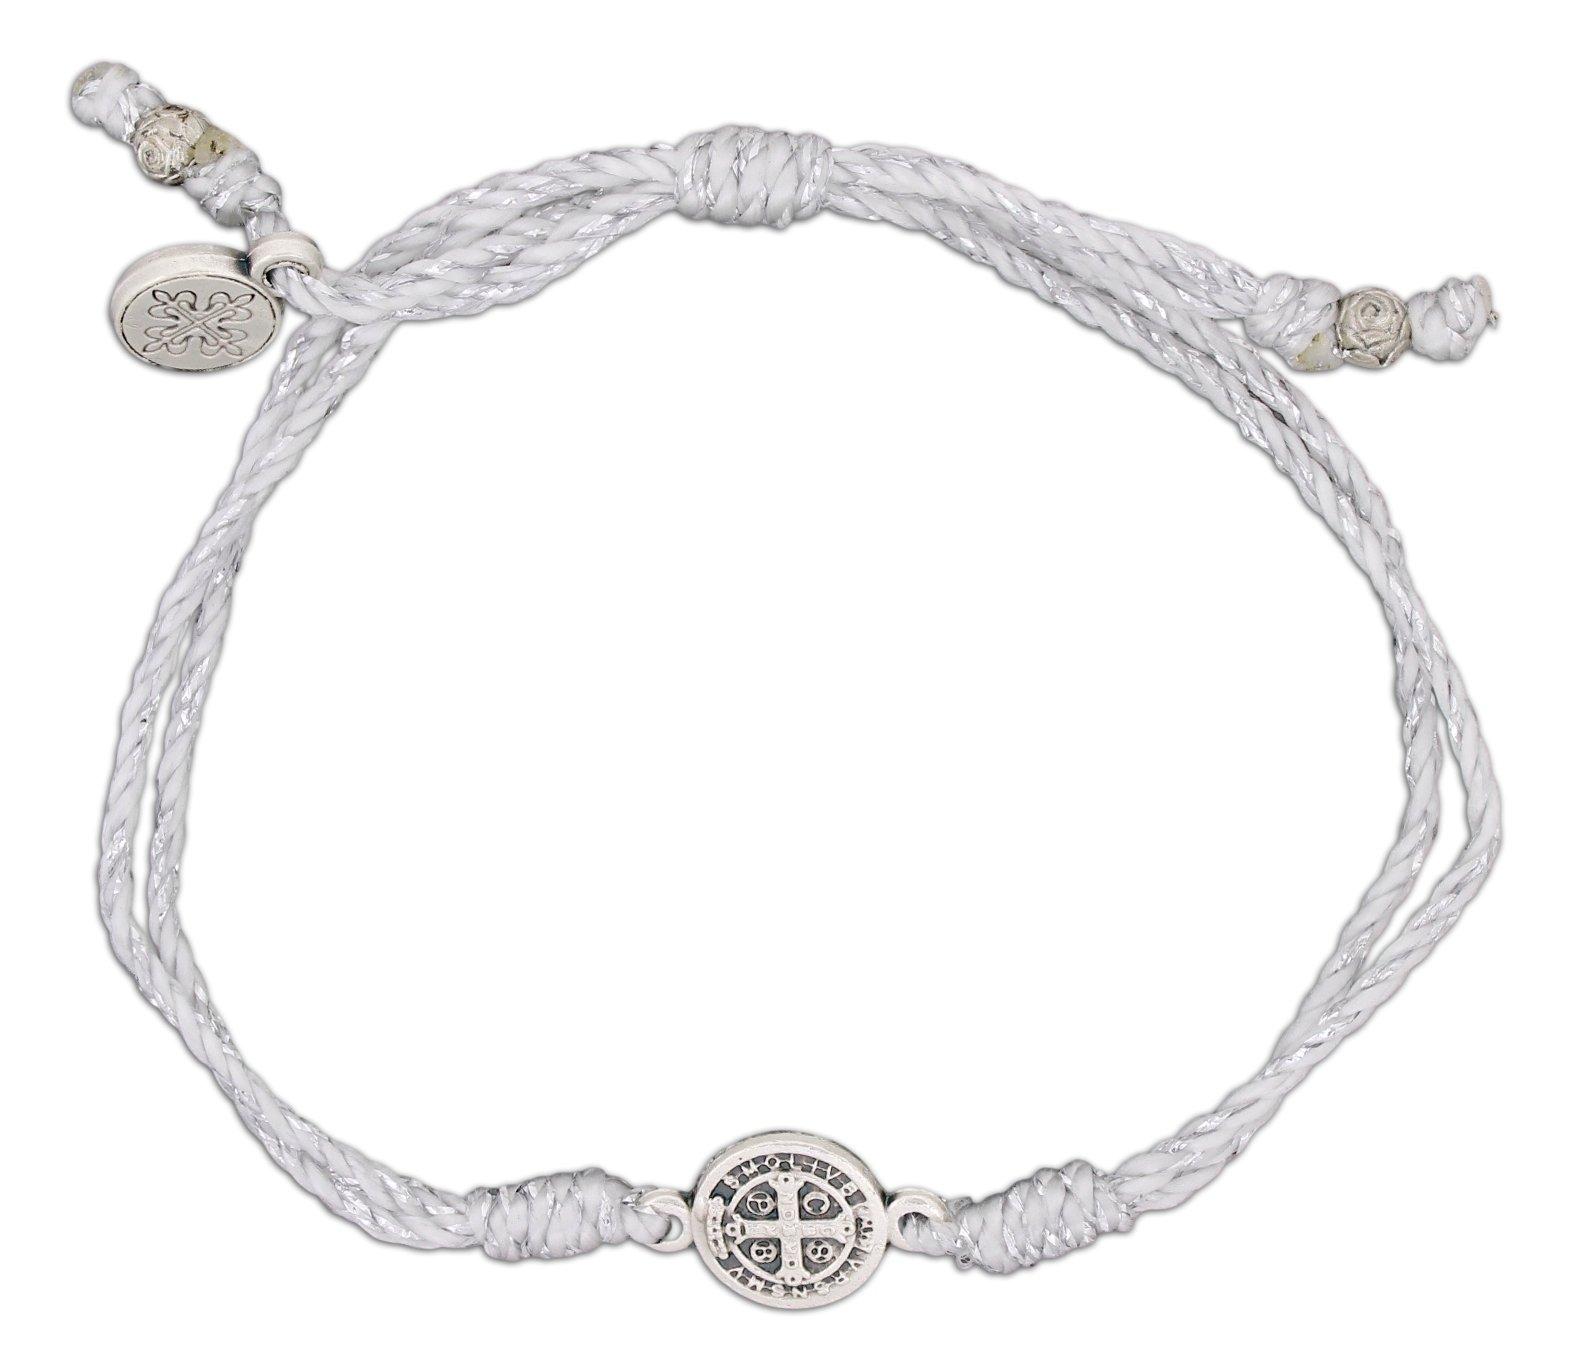 Inspirational Breathe Bracelet, Adjustable (Silver Tone on Metallic Silver)